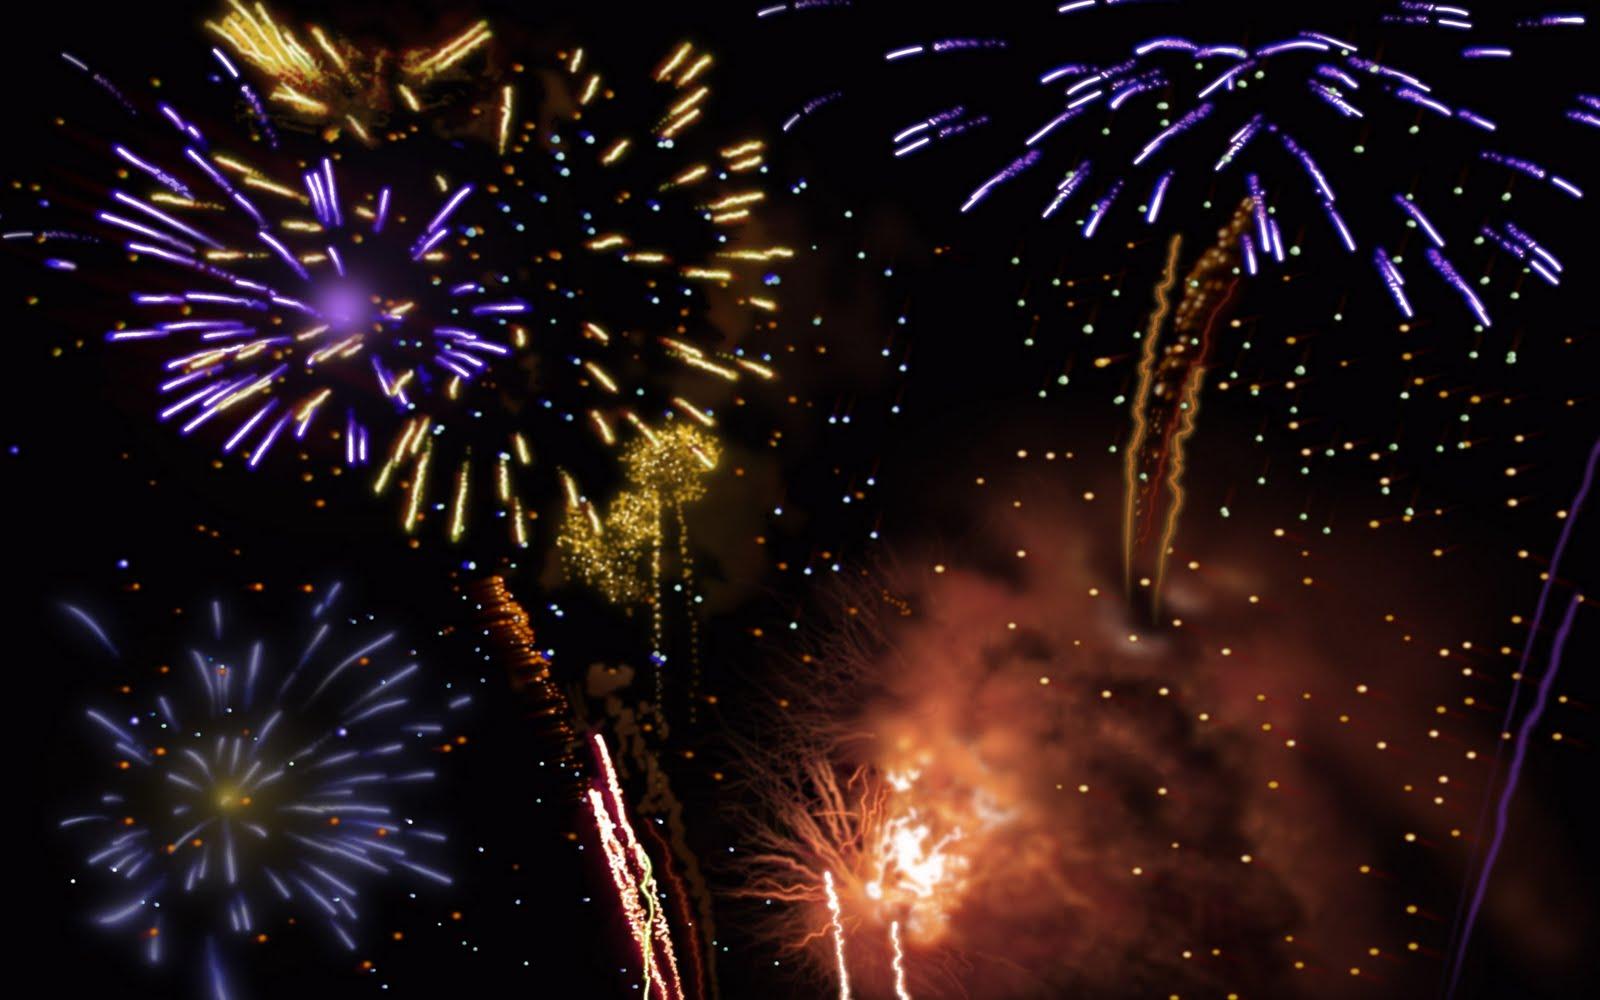 http://3.bp.blogspot.com/-TTECyG5NgV8/TiGqLf5GudI/AAAAAAAACso/RYvlYzxgMx8/s1600/fireworks-wallpaper-wallpaper-download-15.jpg